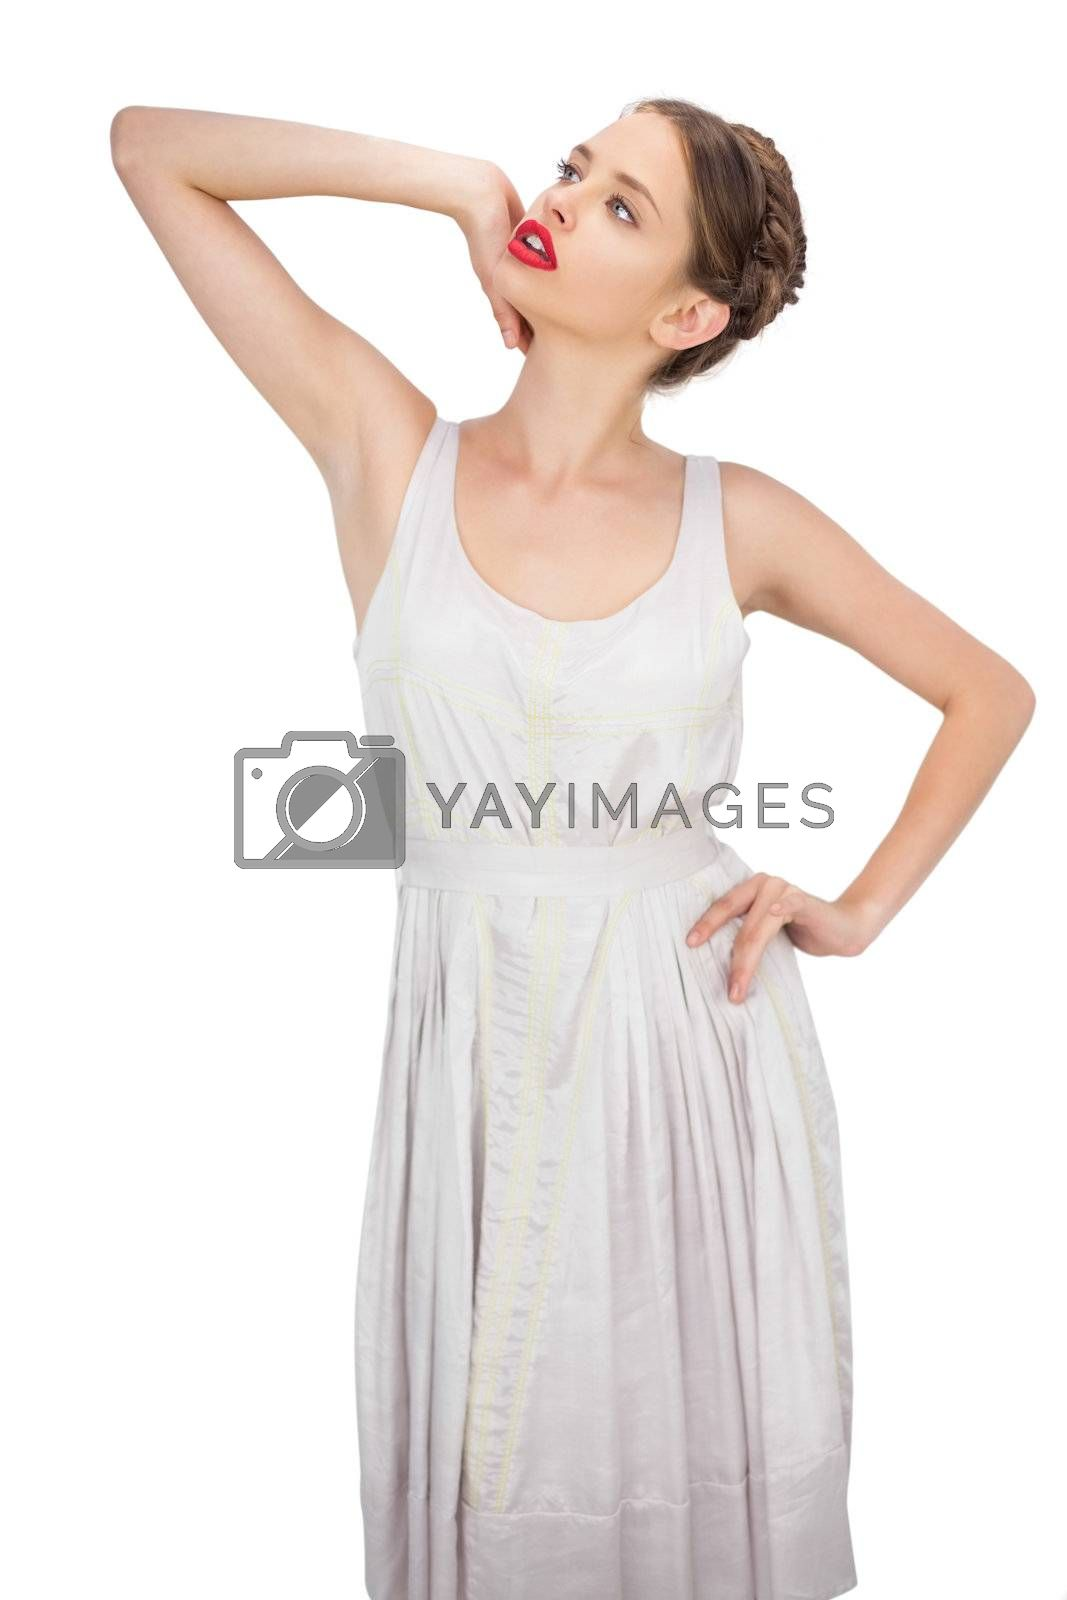 Sensual model in white dress posing looking away by Wavebreakmedia